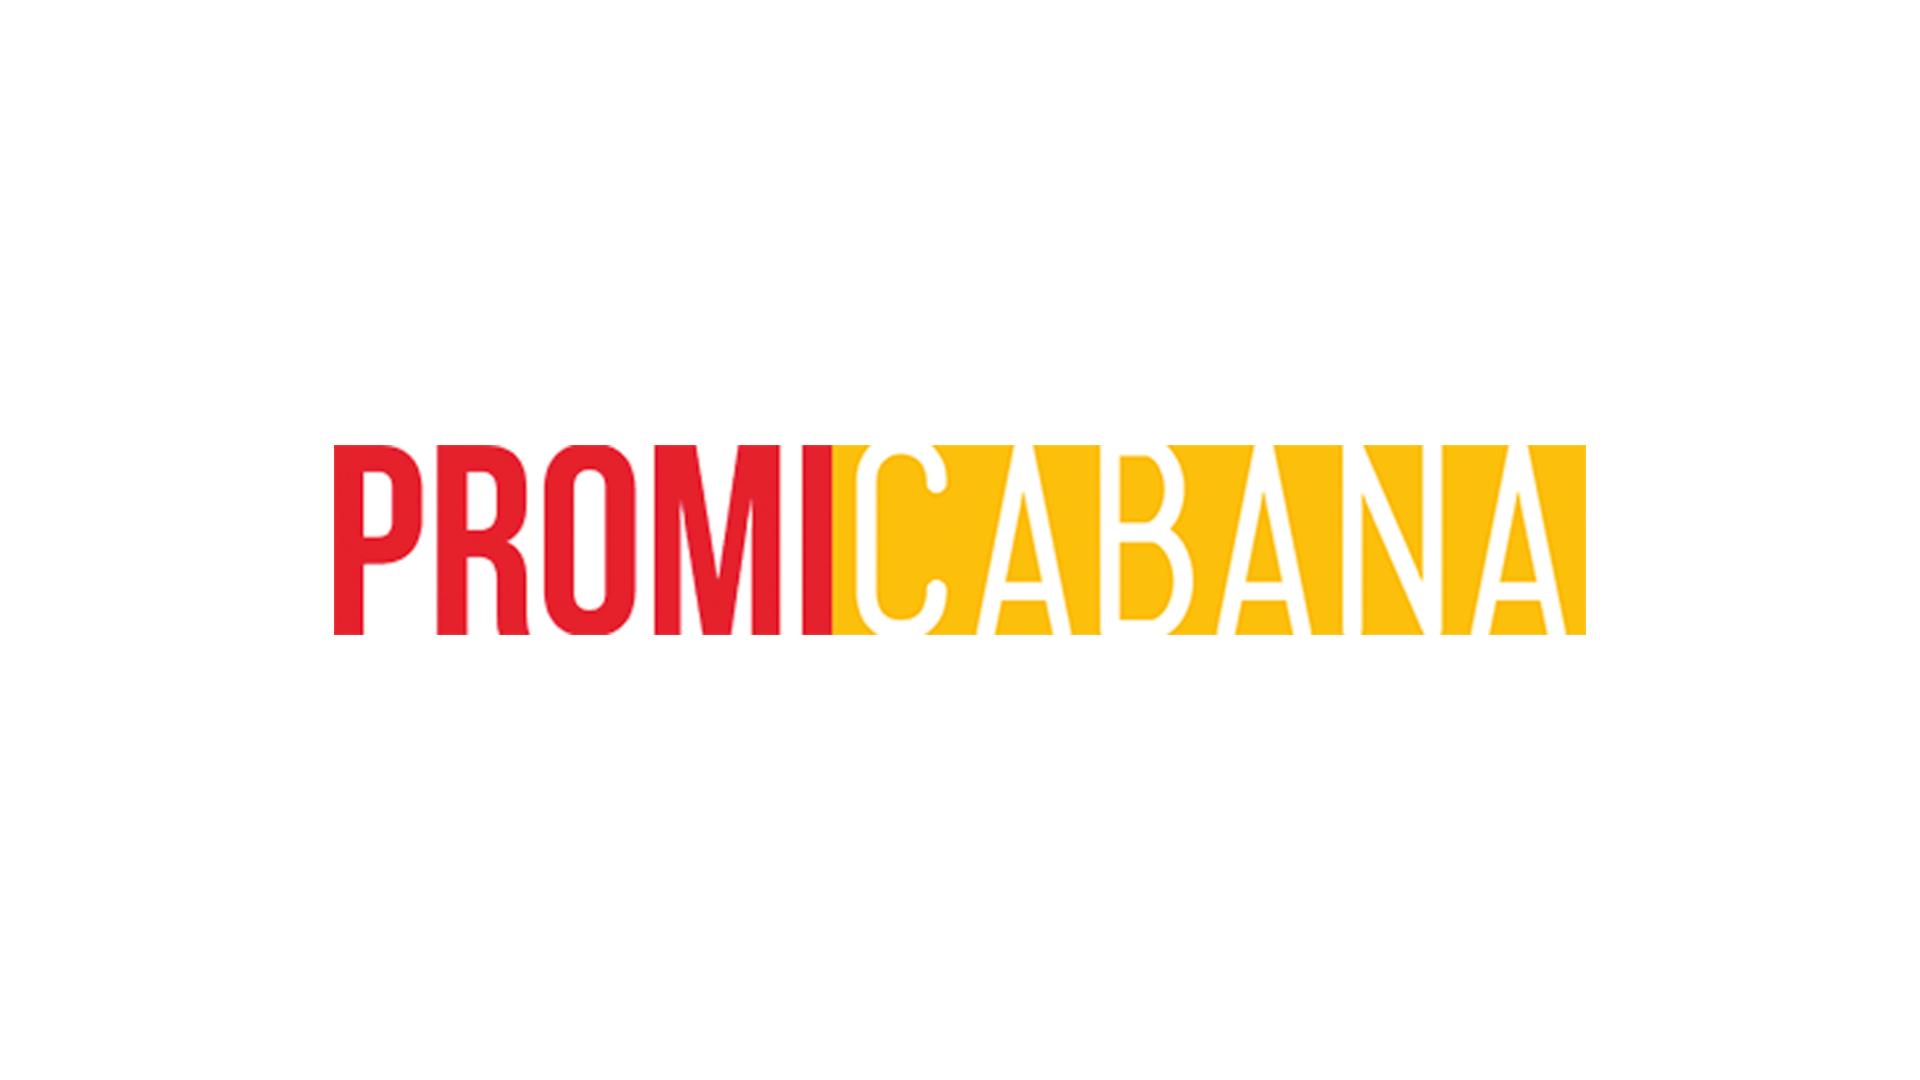 Justin-Timberlake-Jay-Leno-September-2013